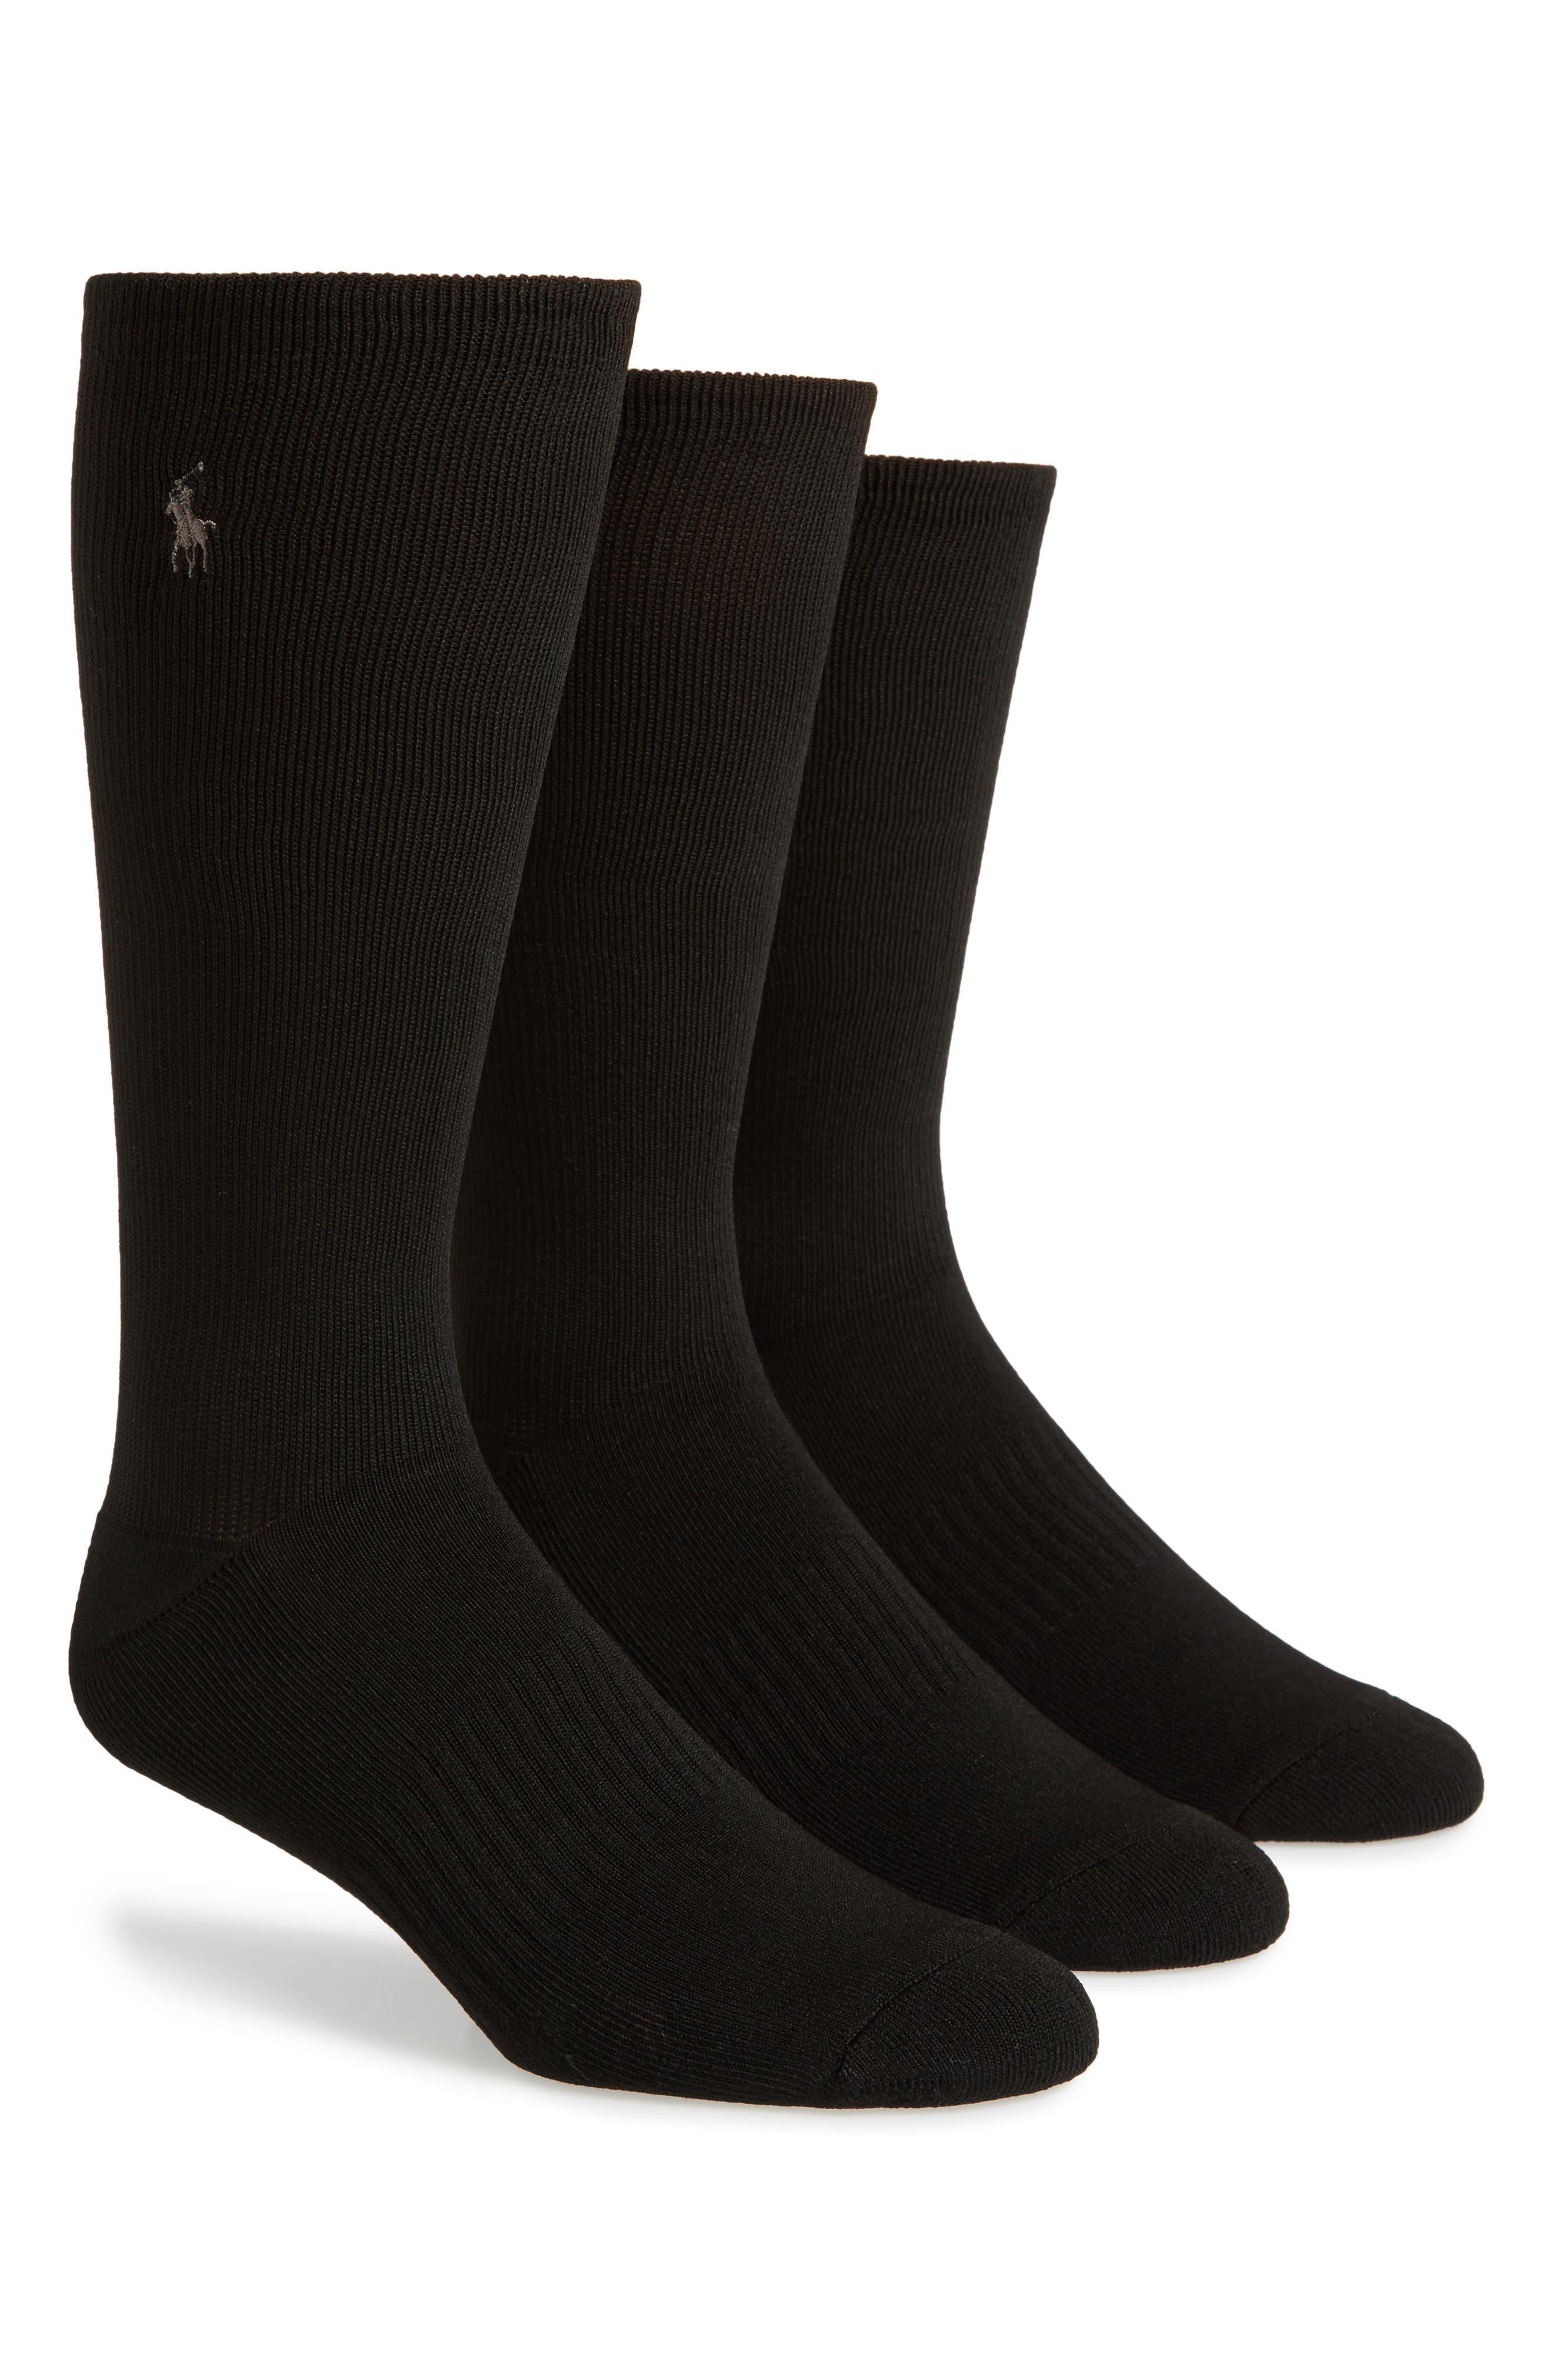 3-Pack Compression Socks,                             Alternate thumbnail 2, color,                             001